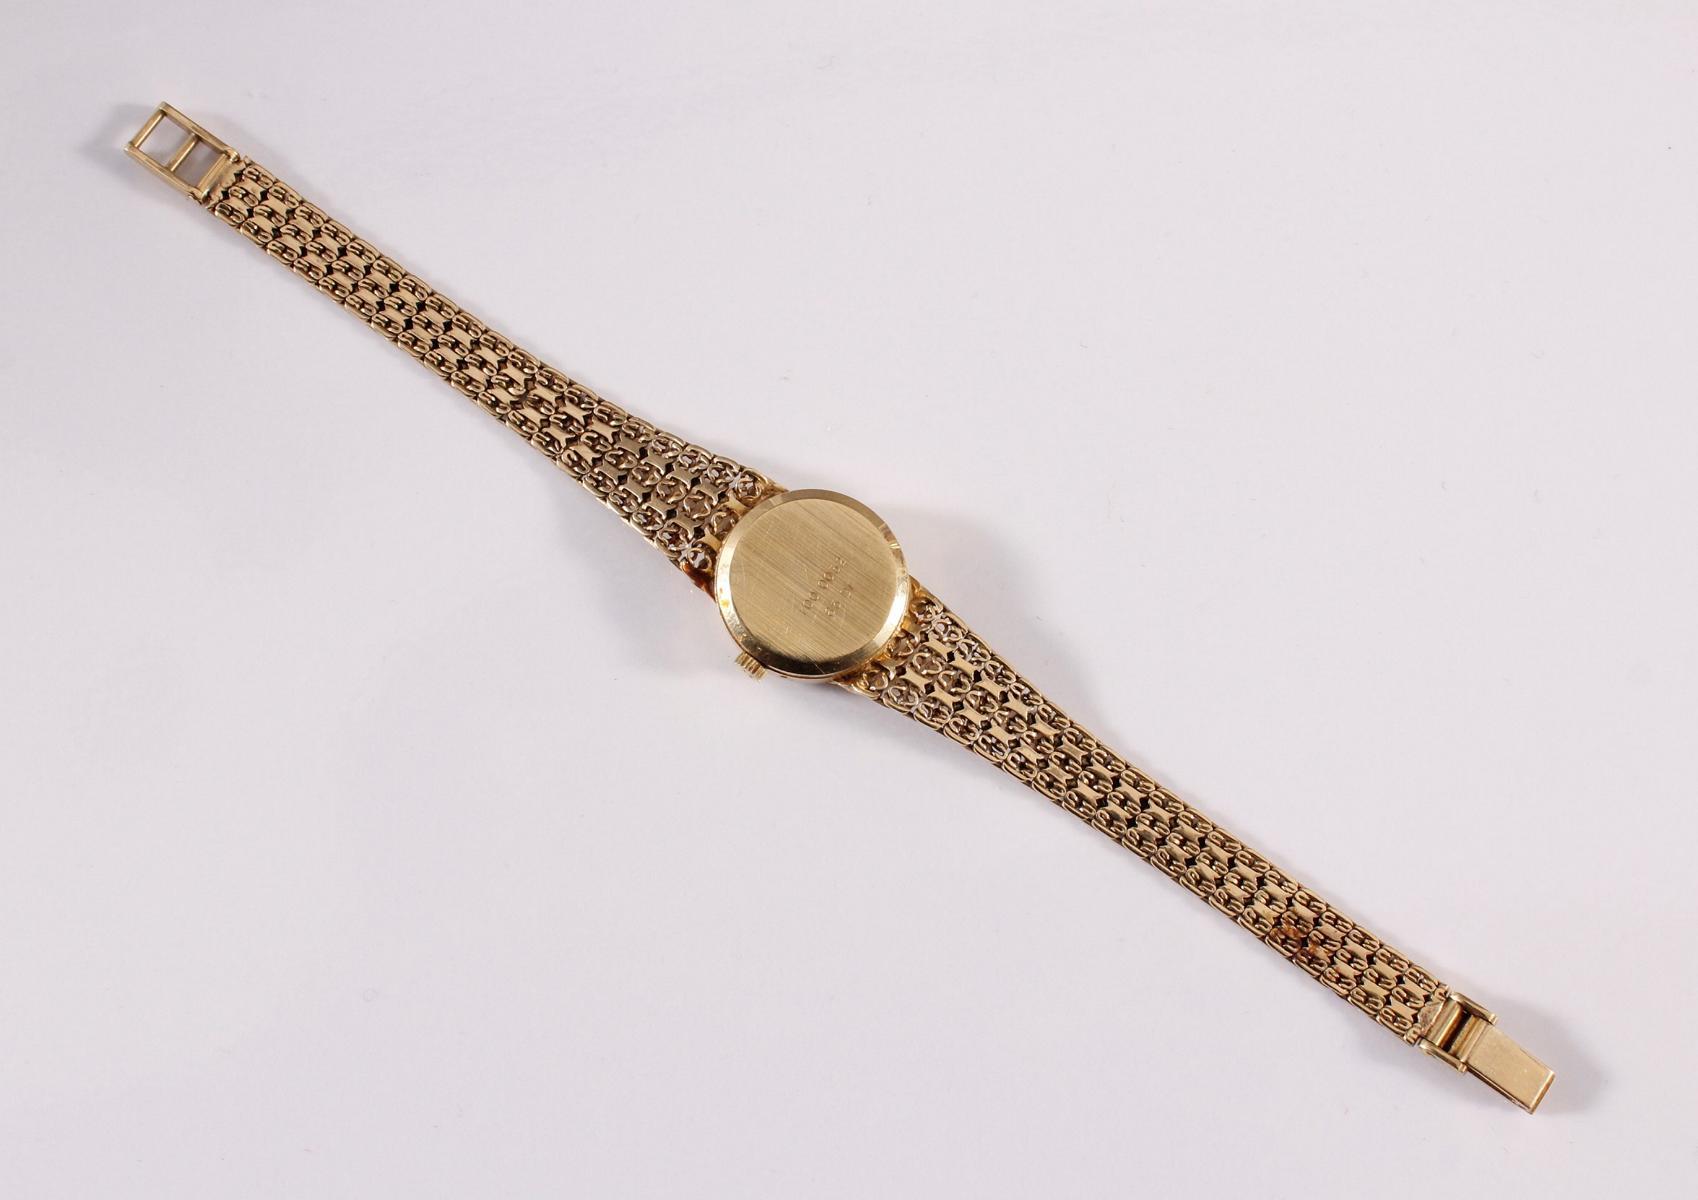 Damenarmbanduhr der Marke Sertina, 14 kt Gelbgold-4